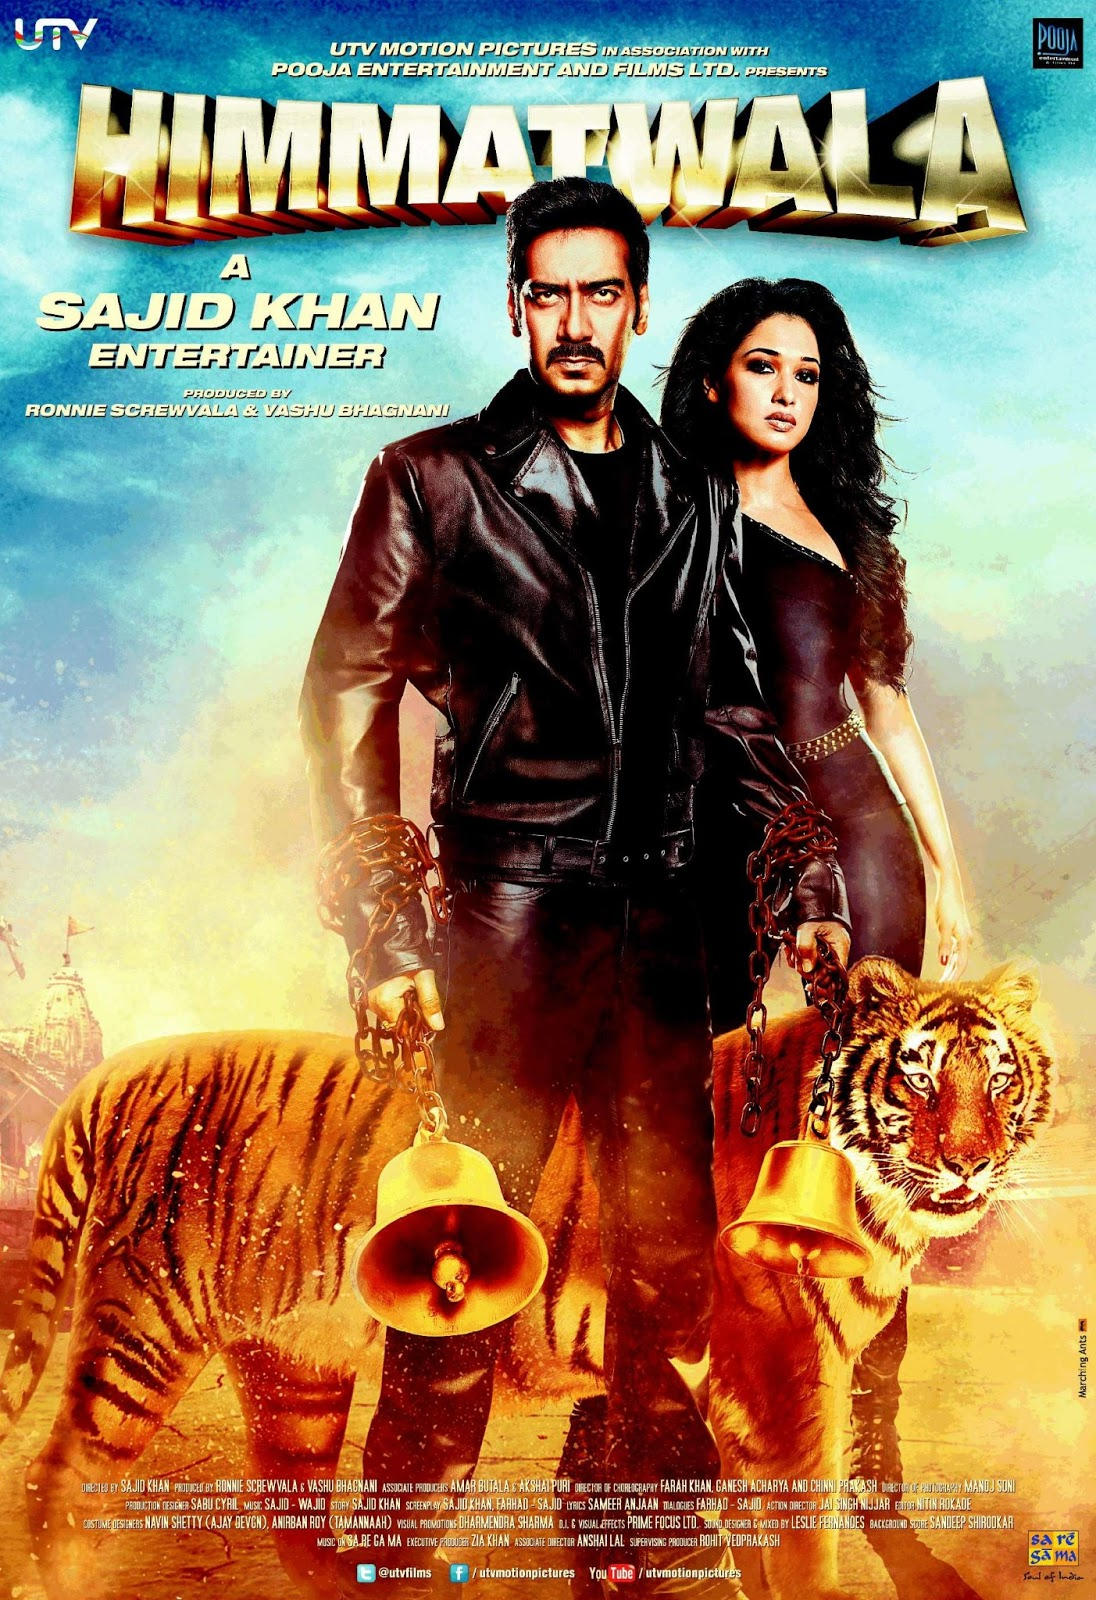 Hindi movie himmatwala full video song / Cast of modern